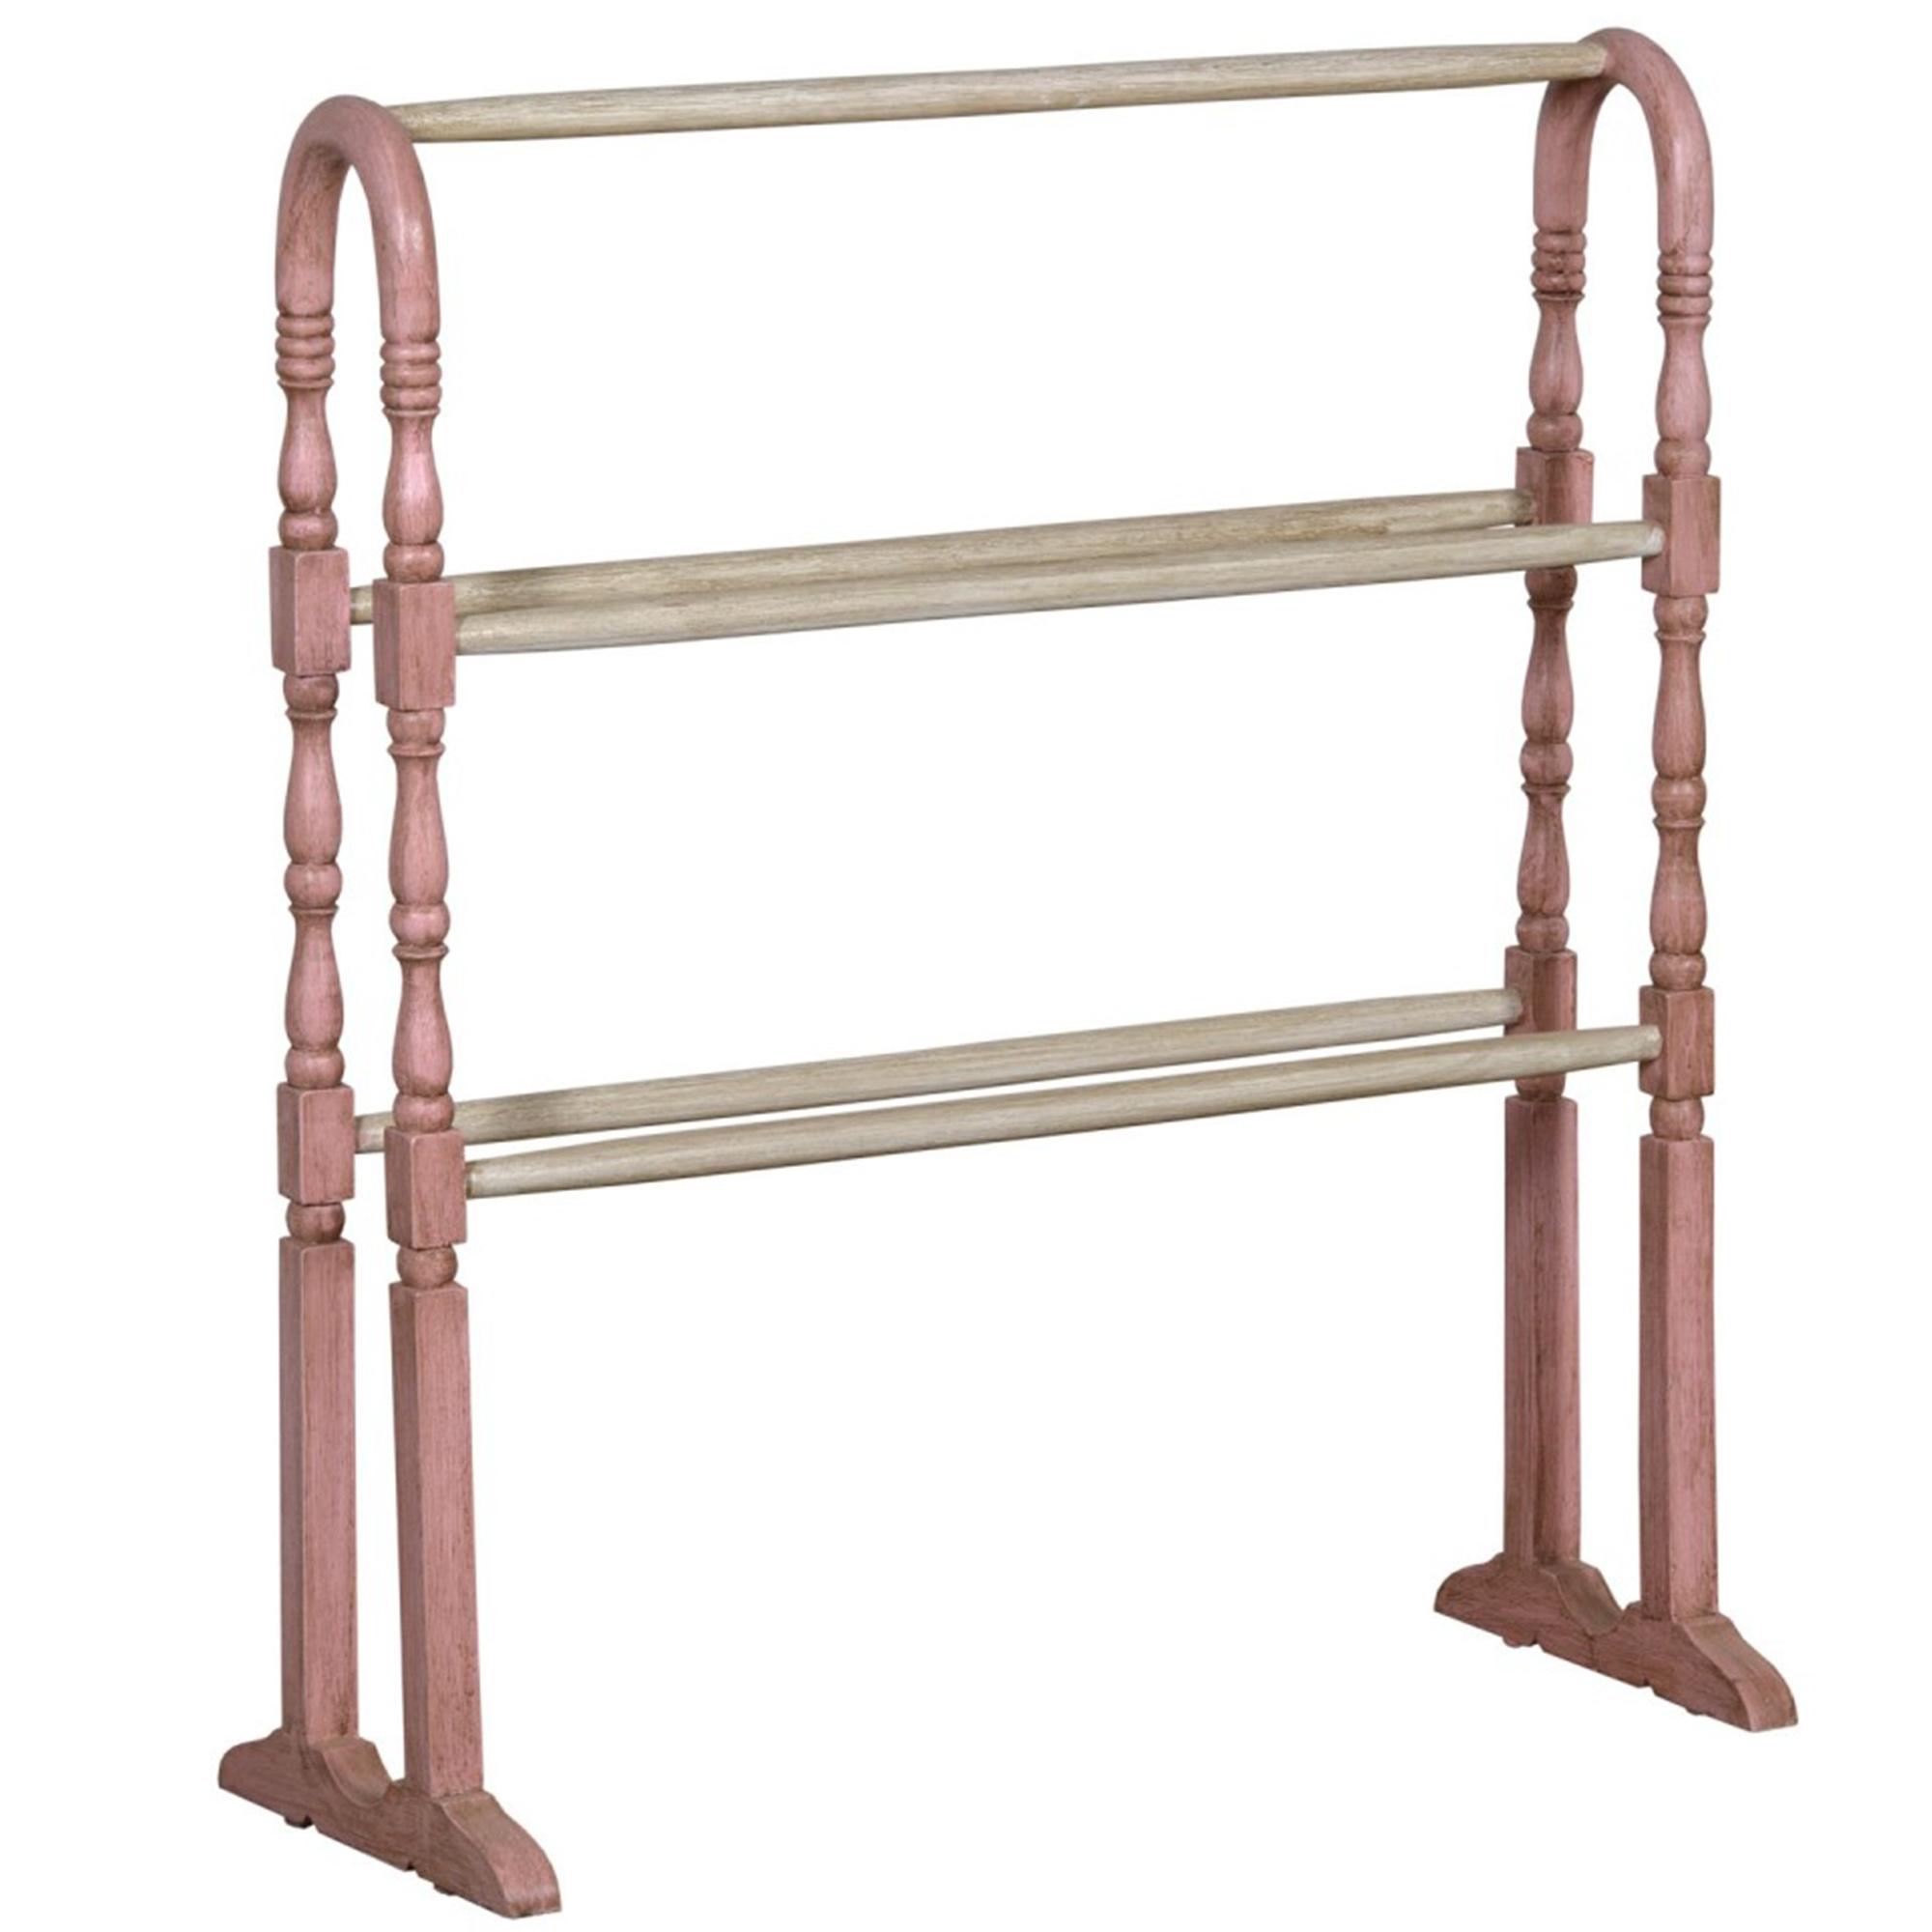 French Bathroom Racks Stands & Holders | French RangeShabby Chic ...